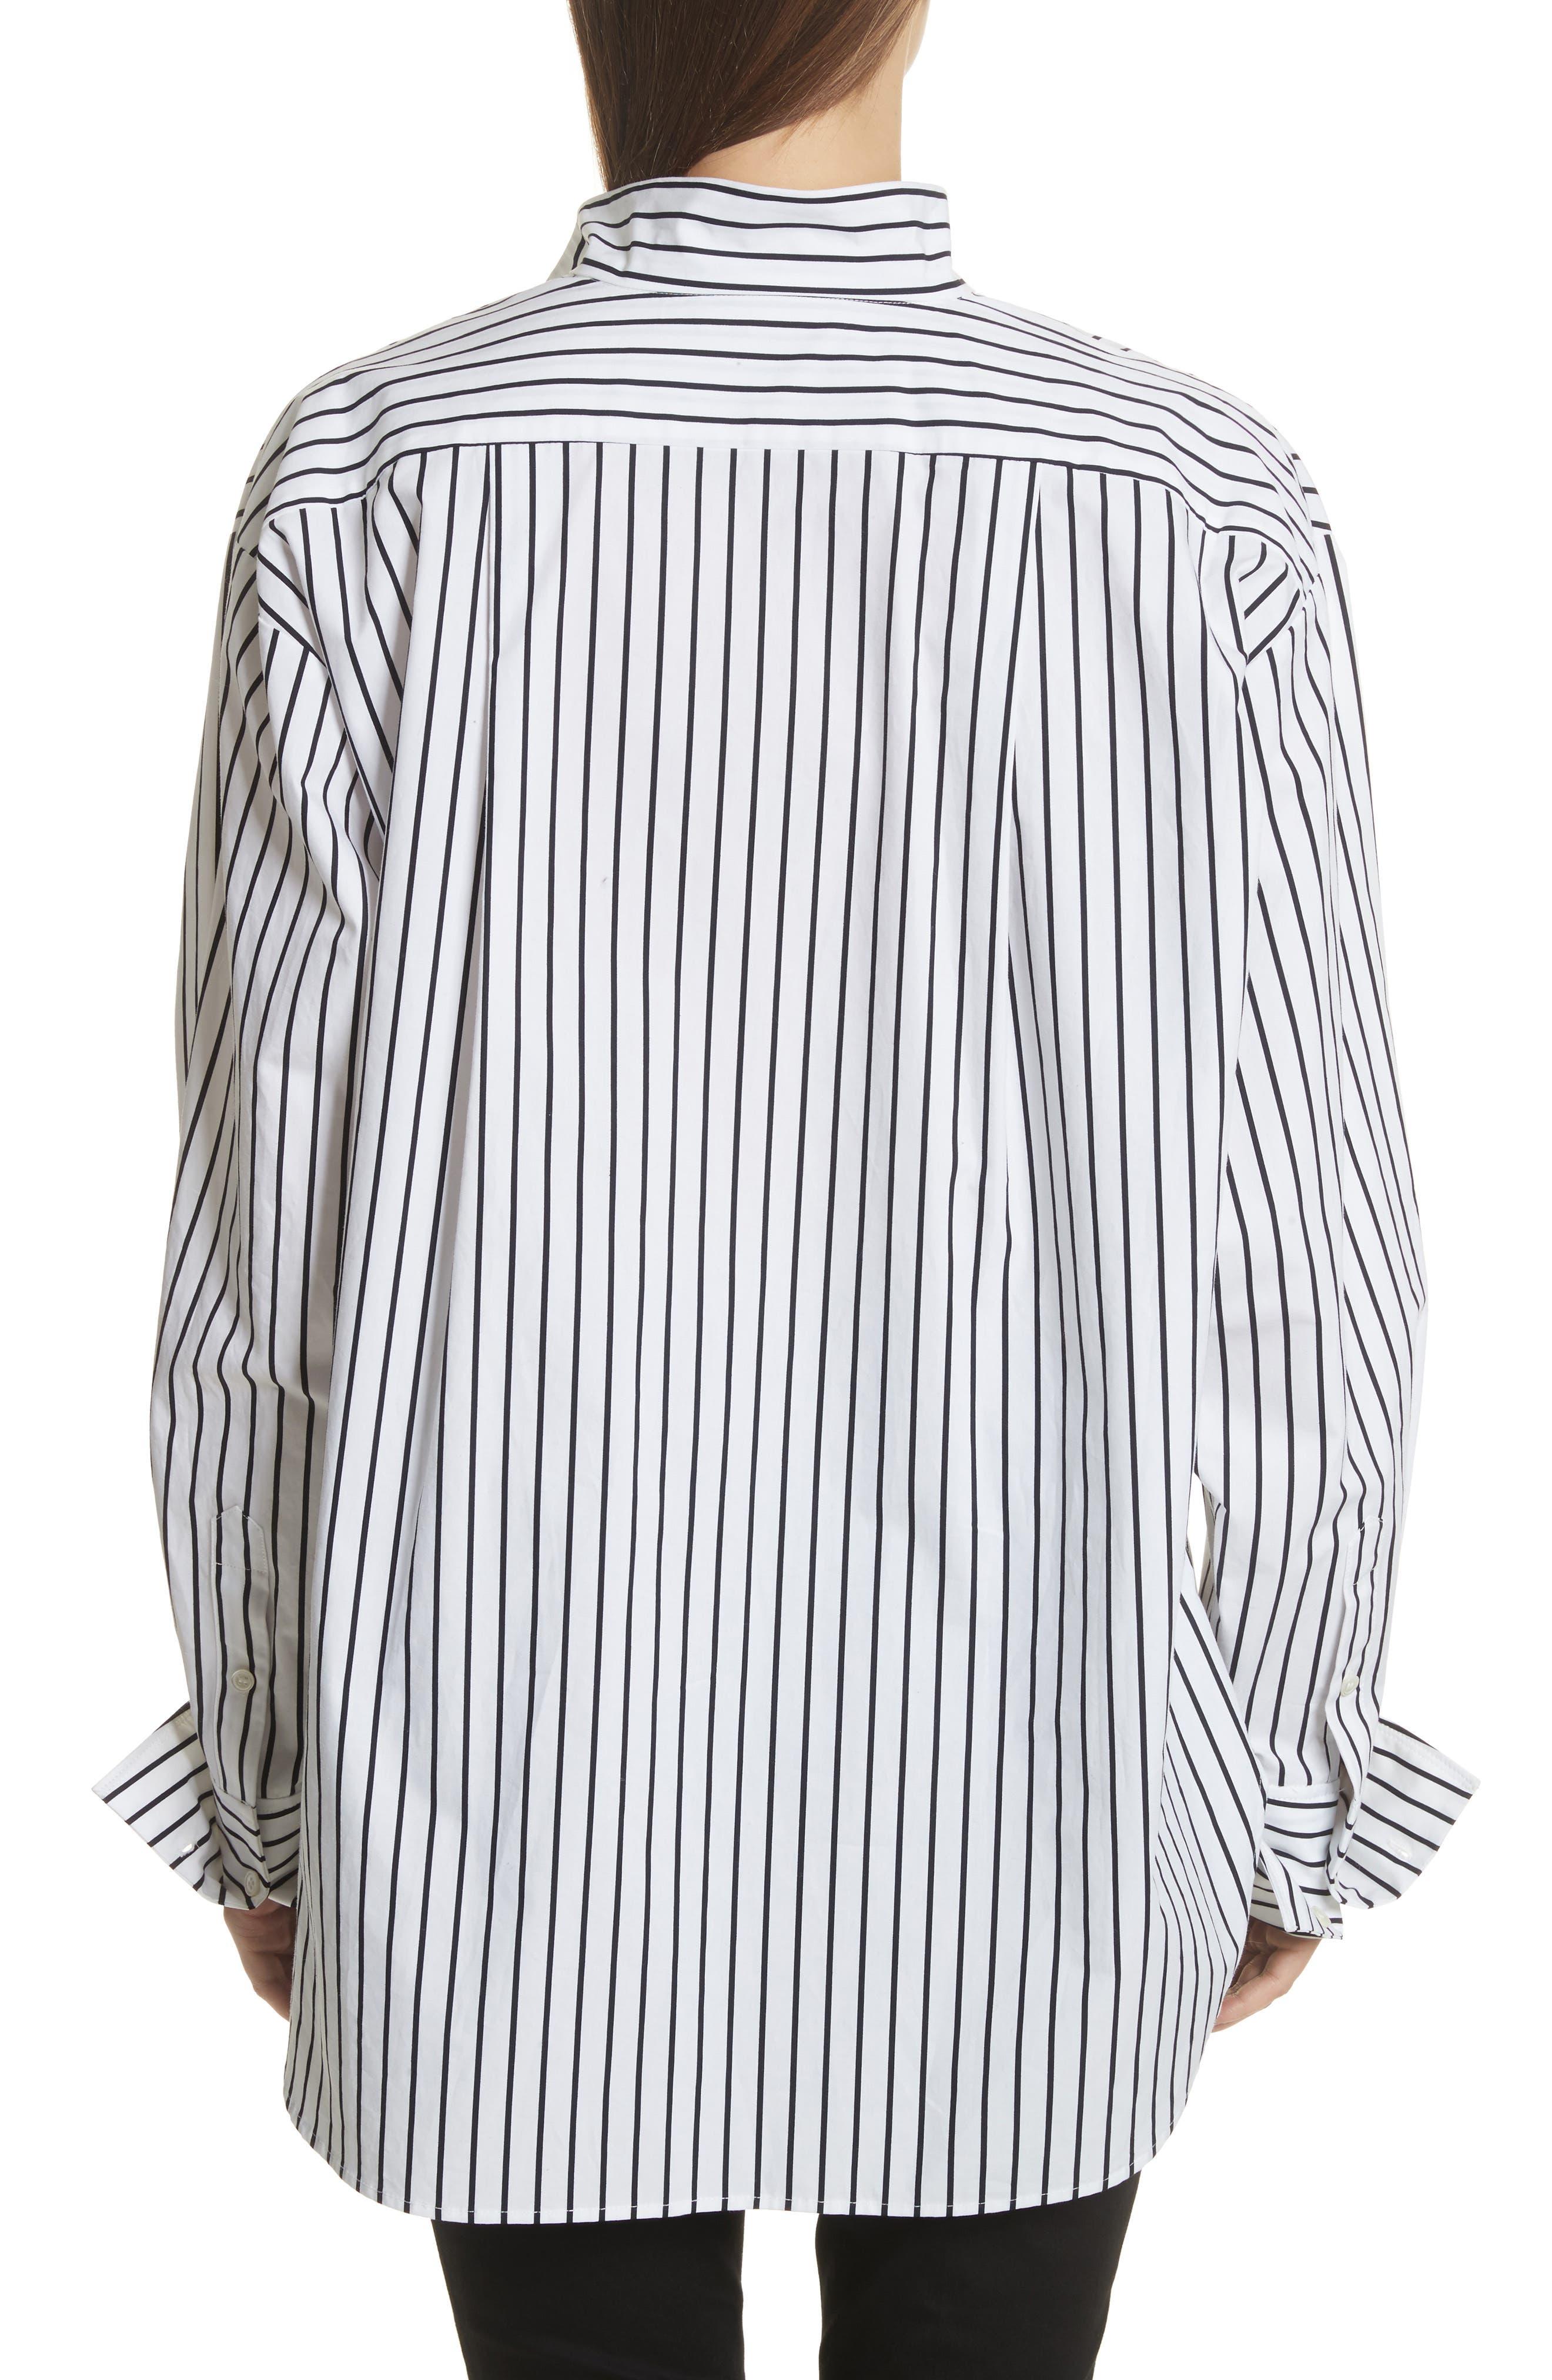 Stripe Cotton Blouse,                             Alternate thumbnail 2, color,                             Navy Multi